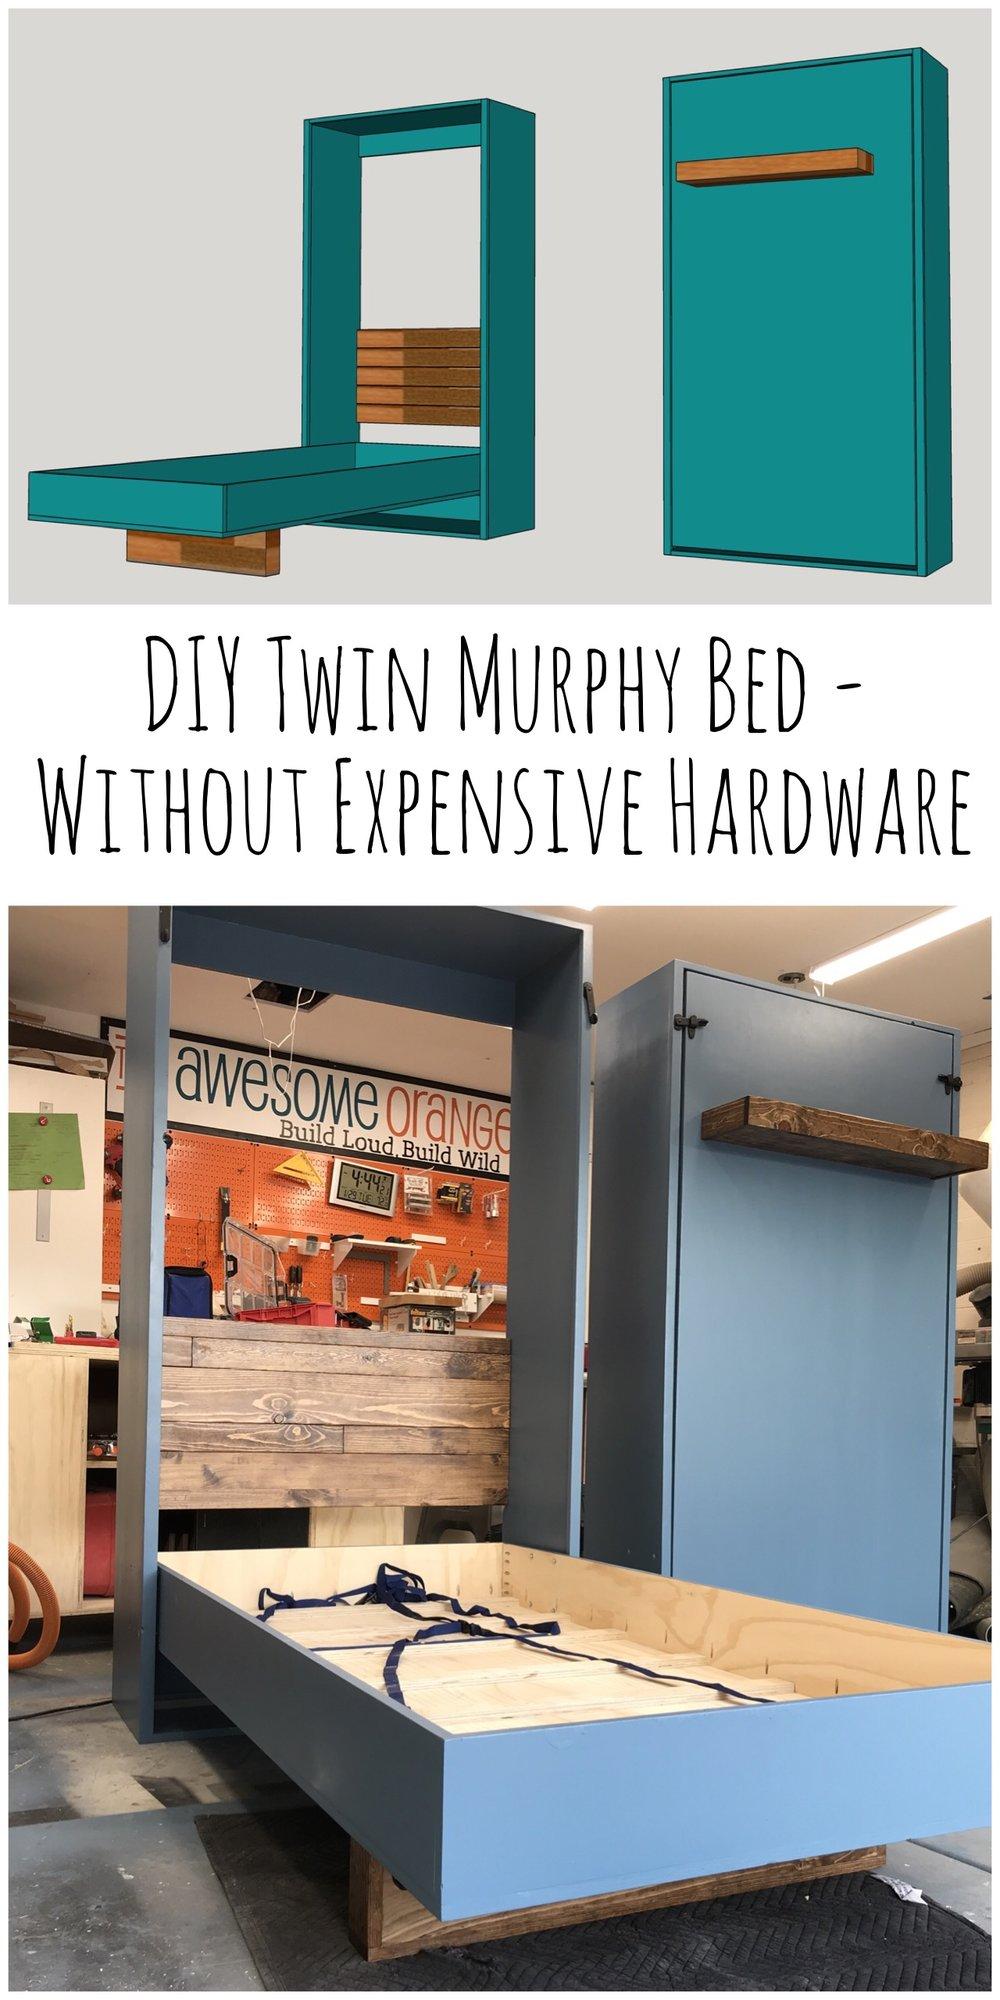 Murphy Bed Pinerest Image.JPG